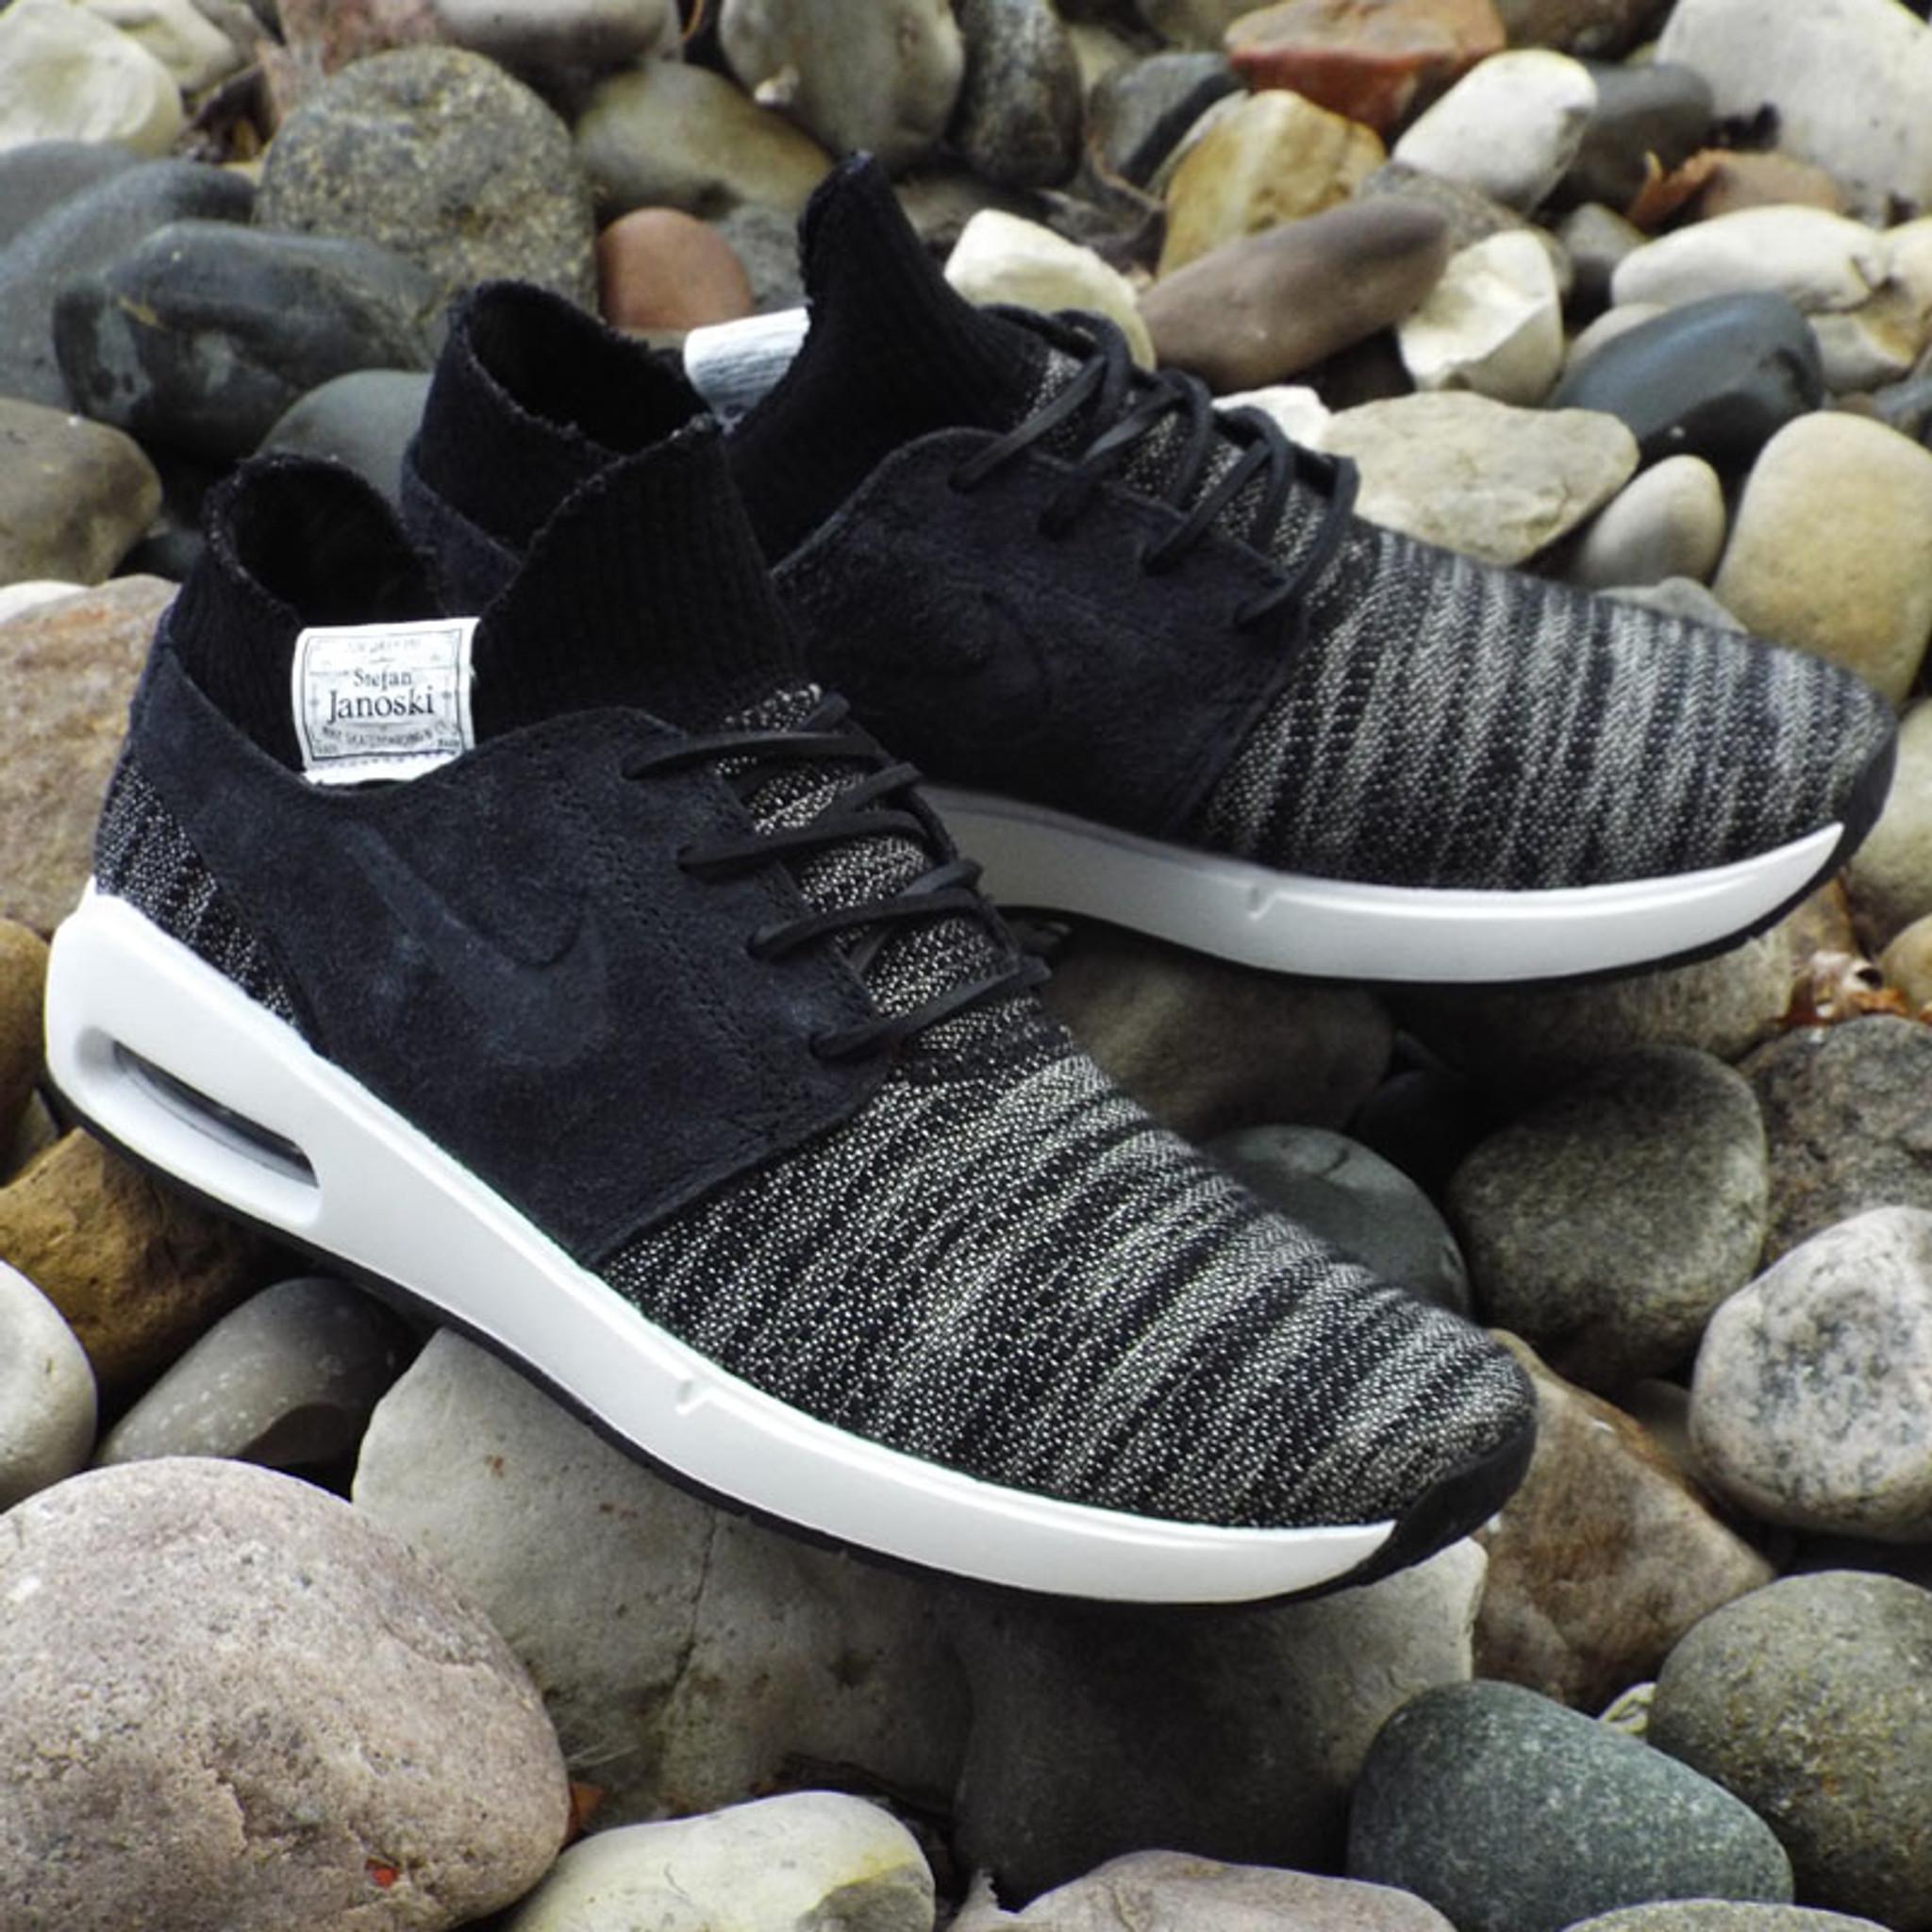 Nike SB Air Max Stefan Janoski 2 Premium Shoes BlackBlack Summit White